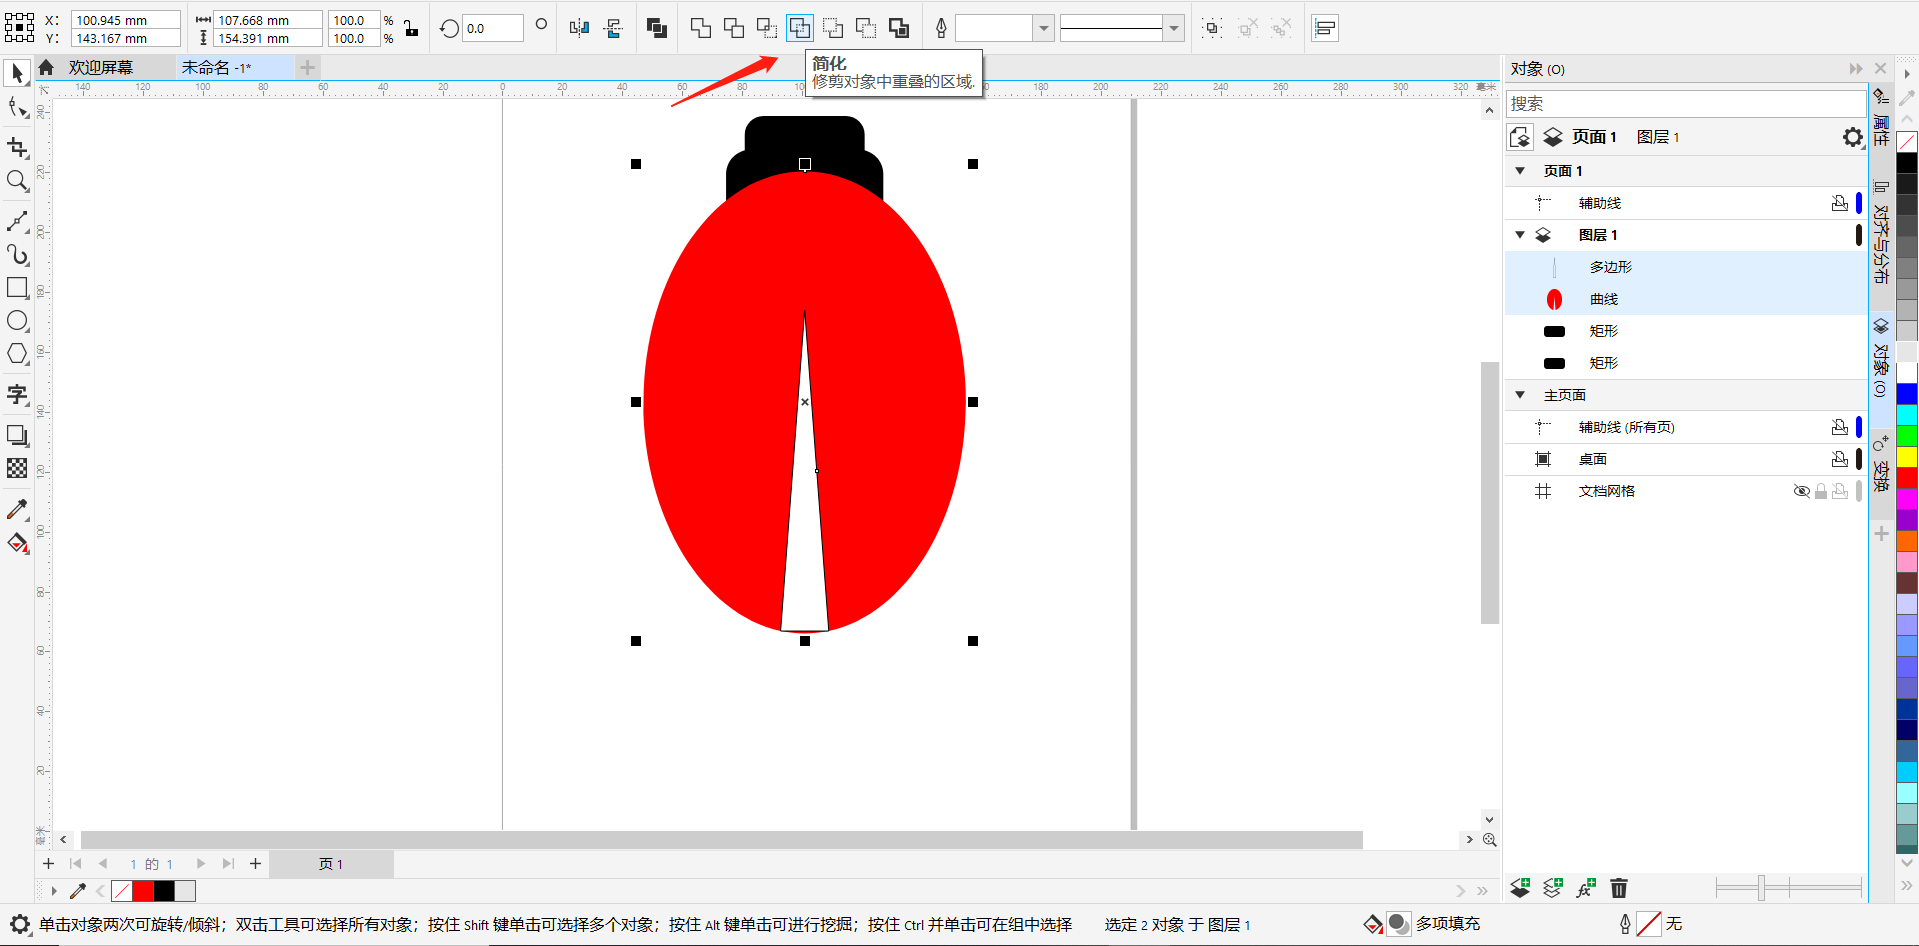 图5:瓢虫翅膀